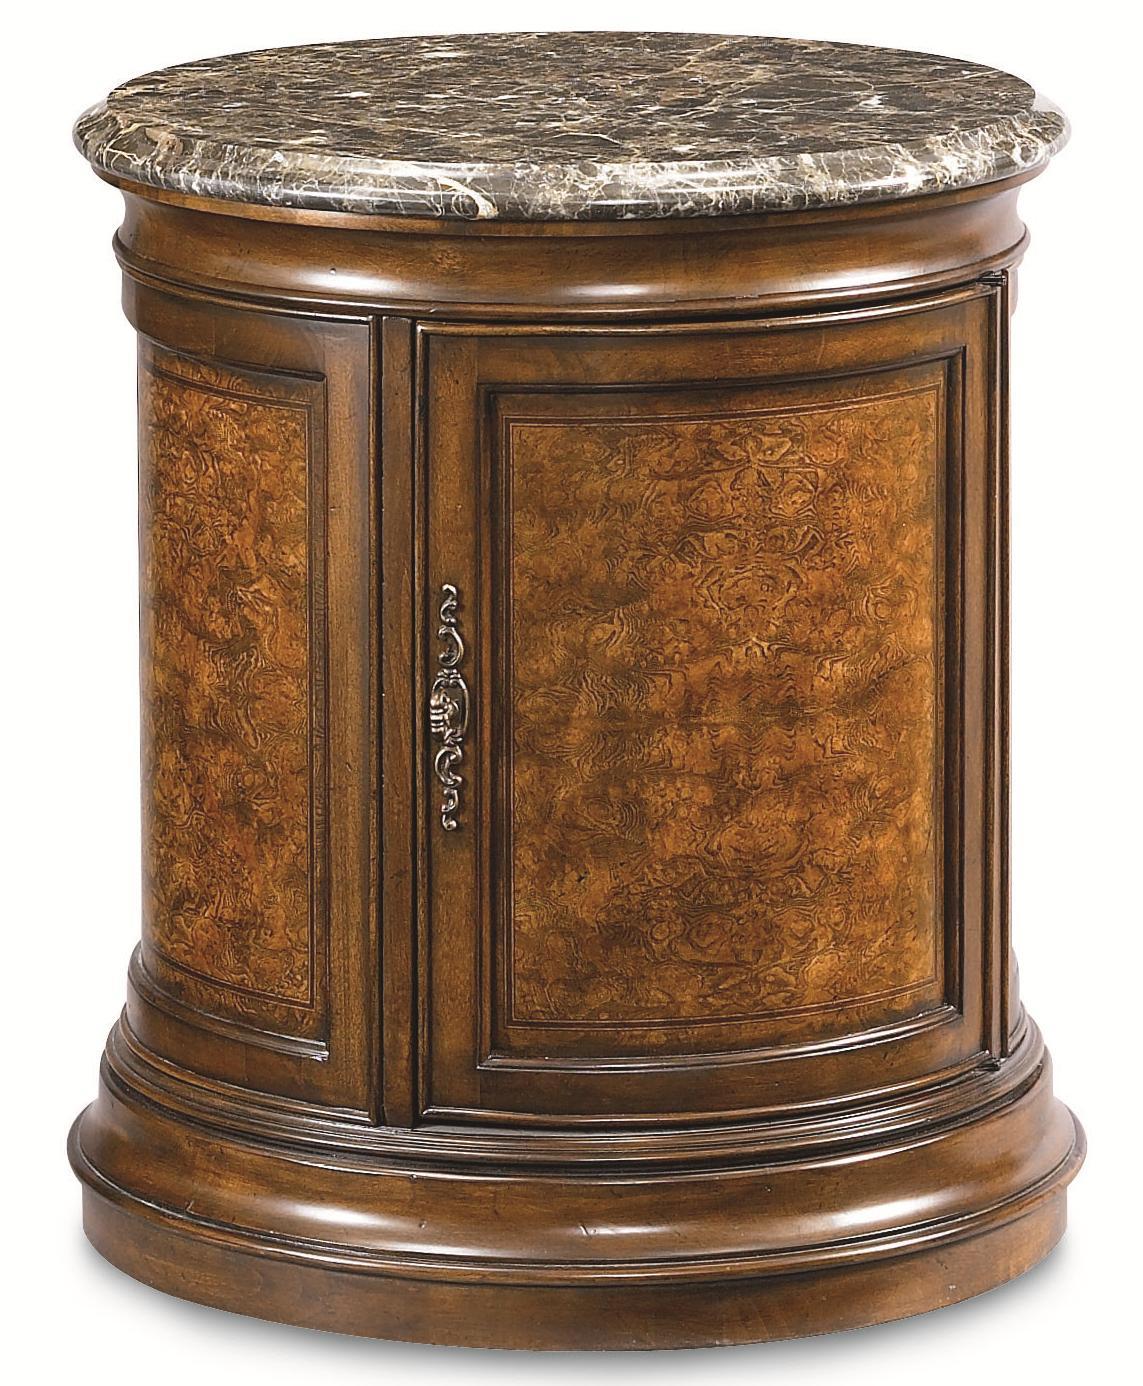 Thomasville® Deschanel Drum Table - Item Number: 46731-330